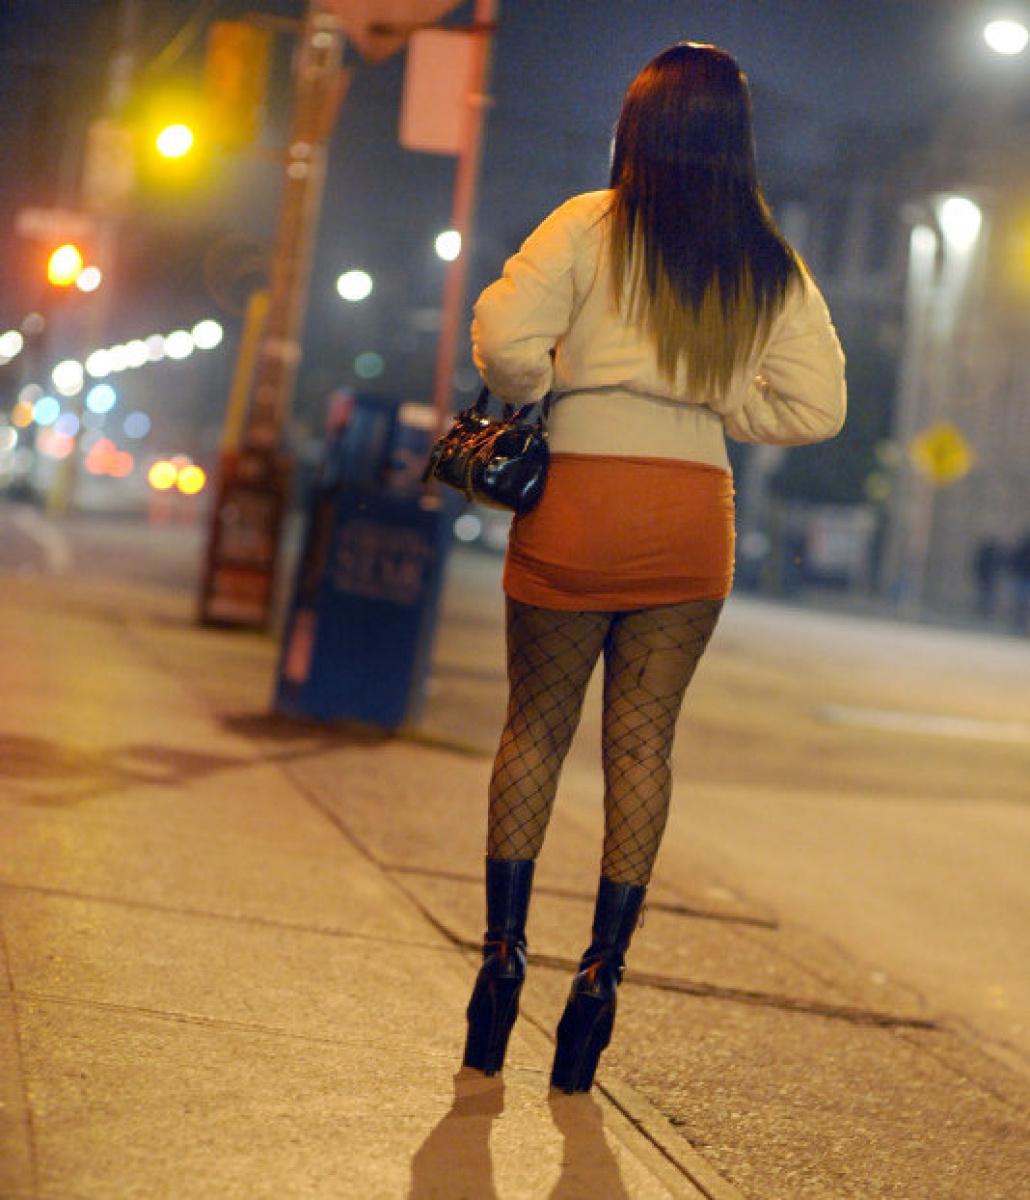 prostitutas aviles prostitutas en wallapop